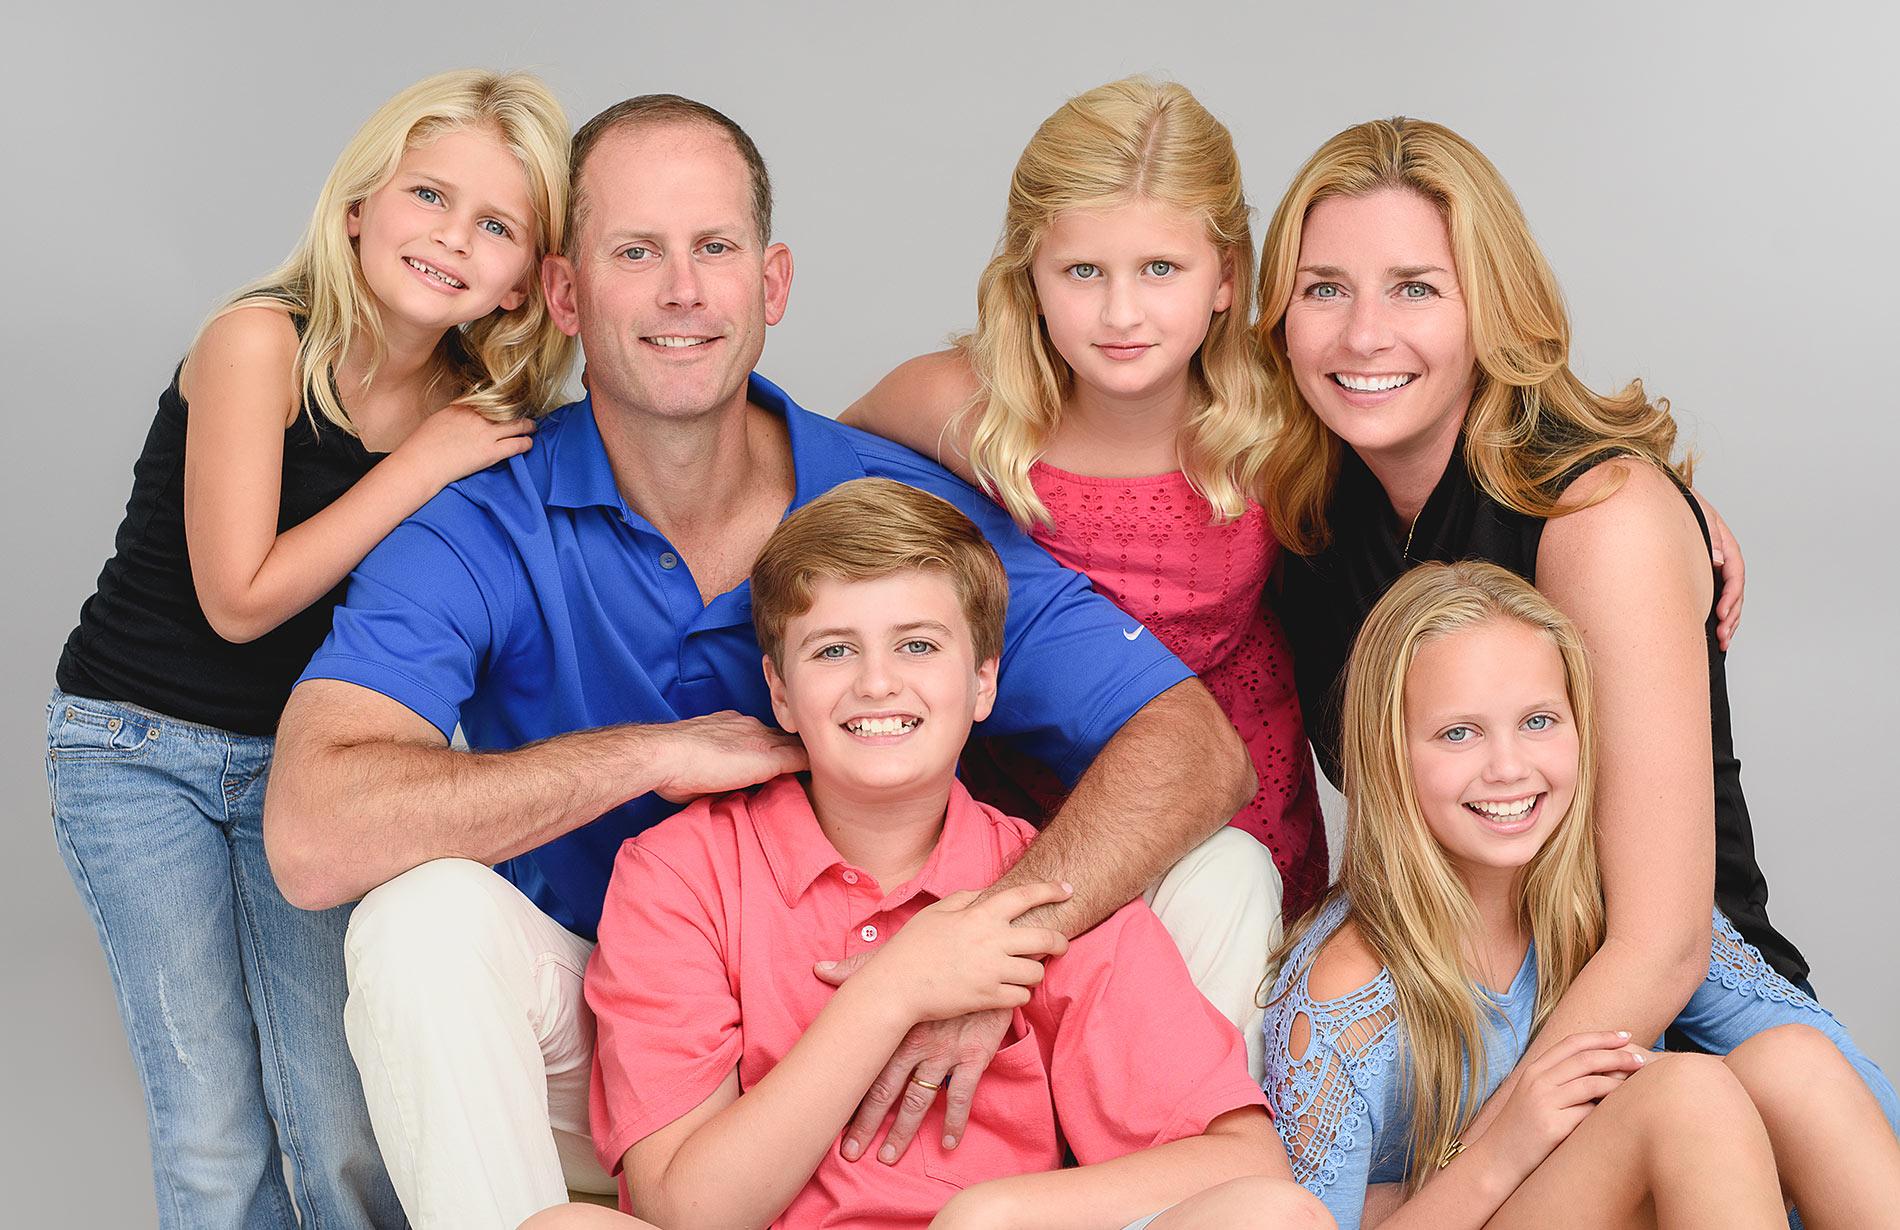 fairfield-county-ct-family-photographer-studio.jpg